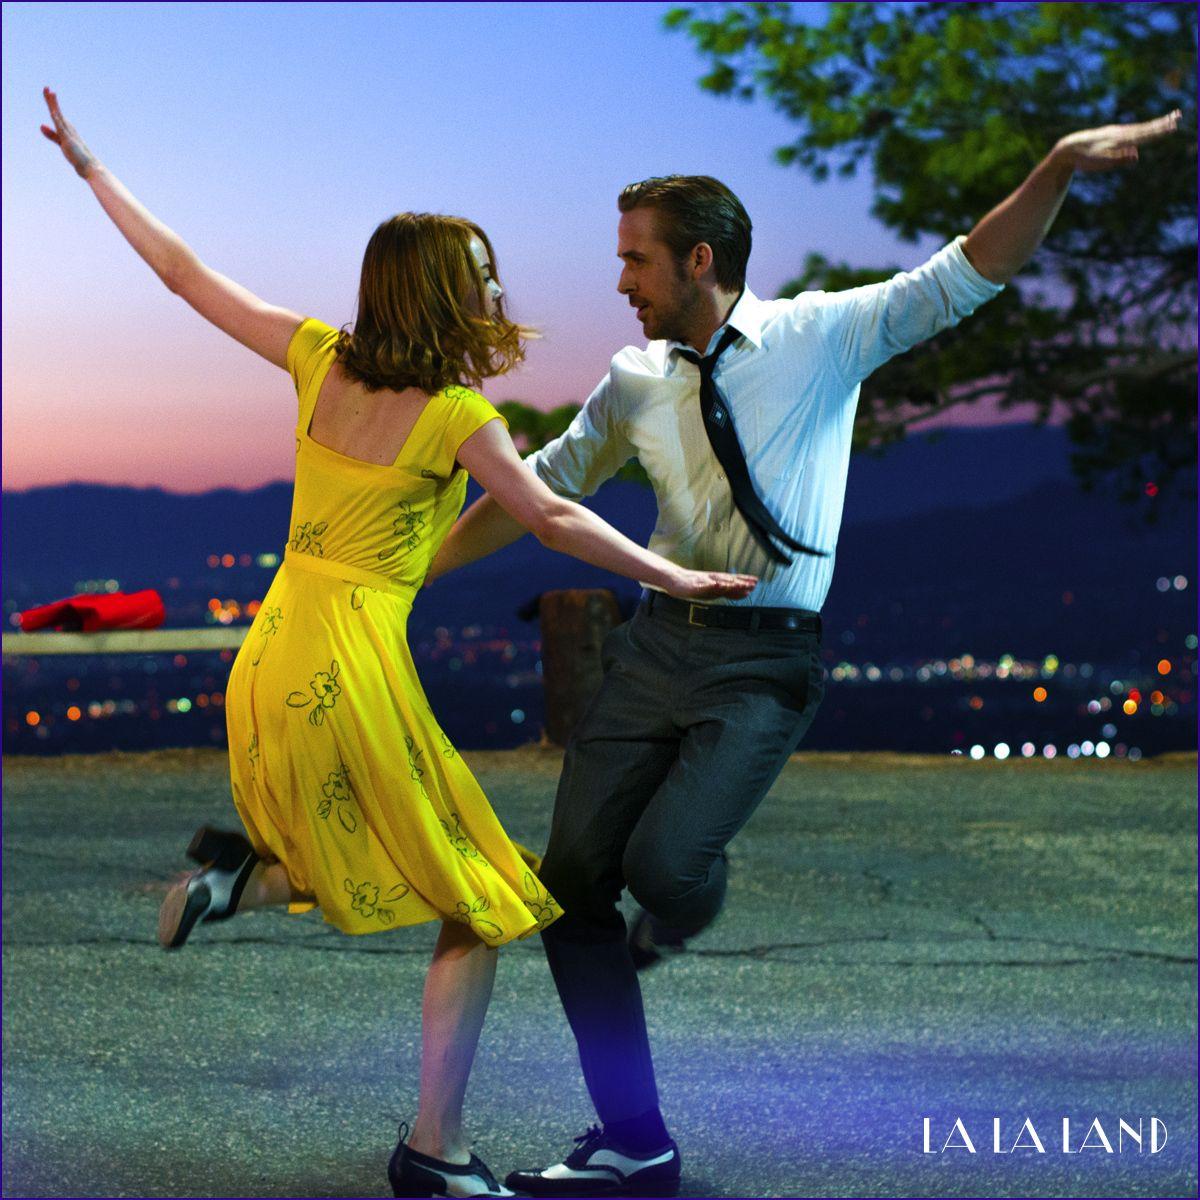 There S Magic In This City Lalaland La La Land Movie Musical Movies La La Land